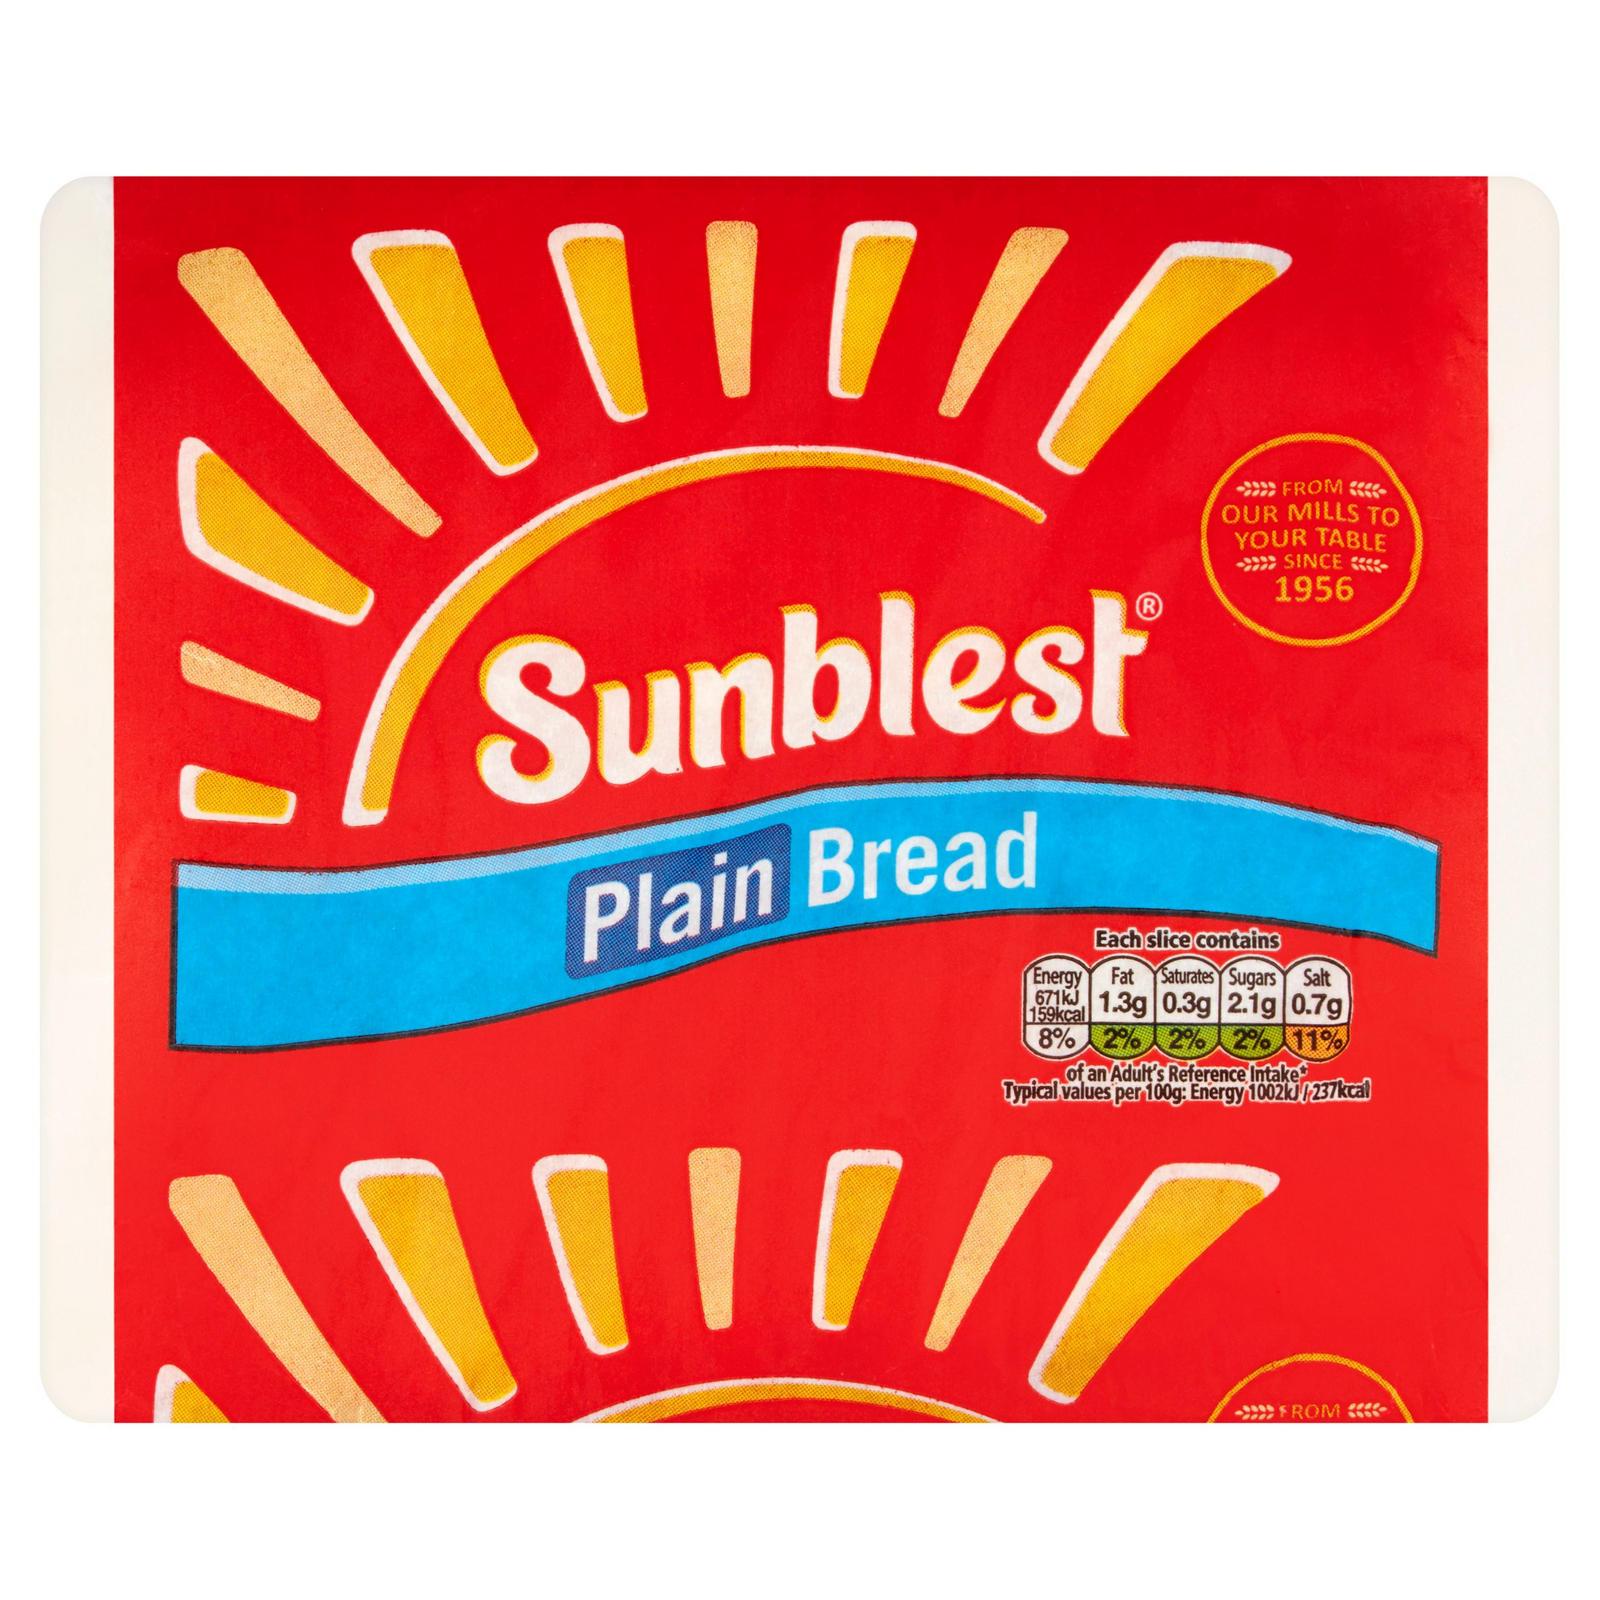 Sunblest bread 800g - 39p at Farmfoods Llanelli